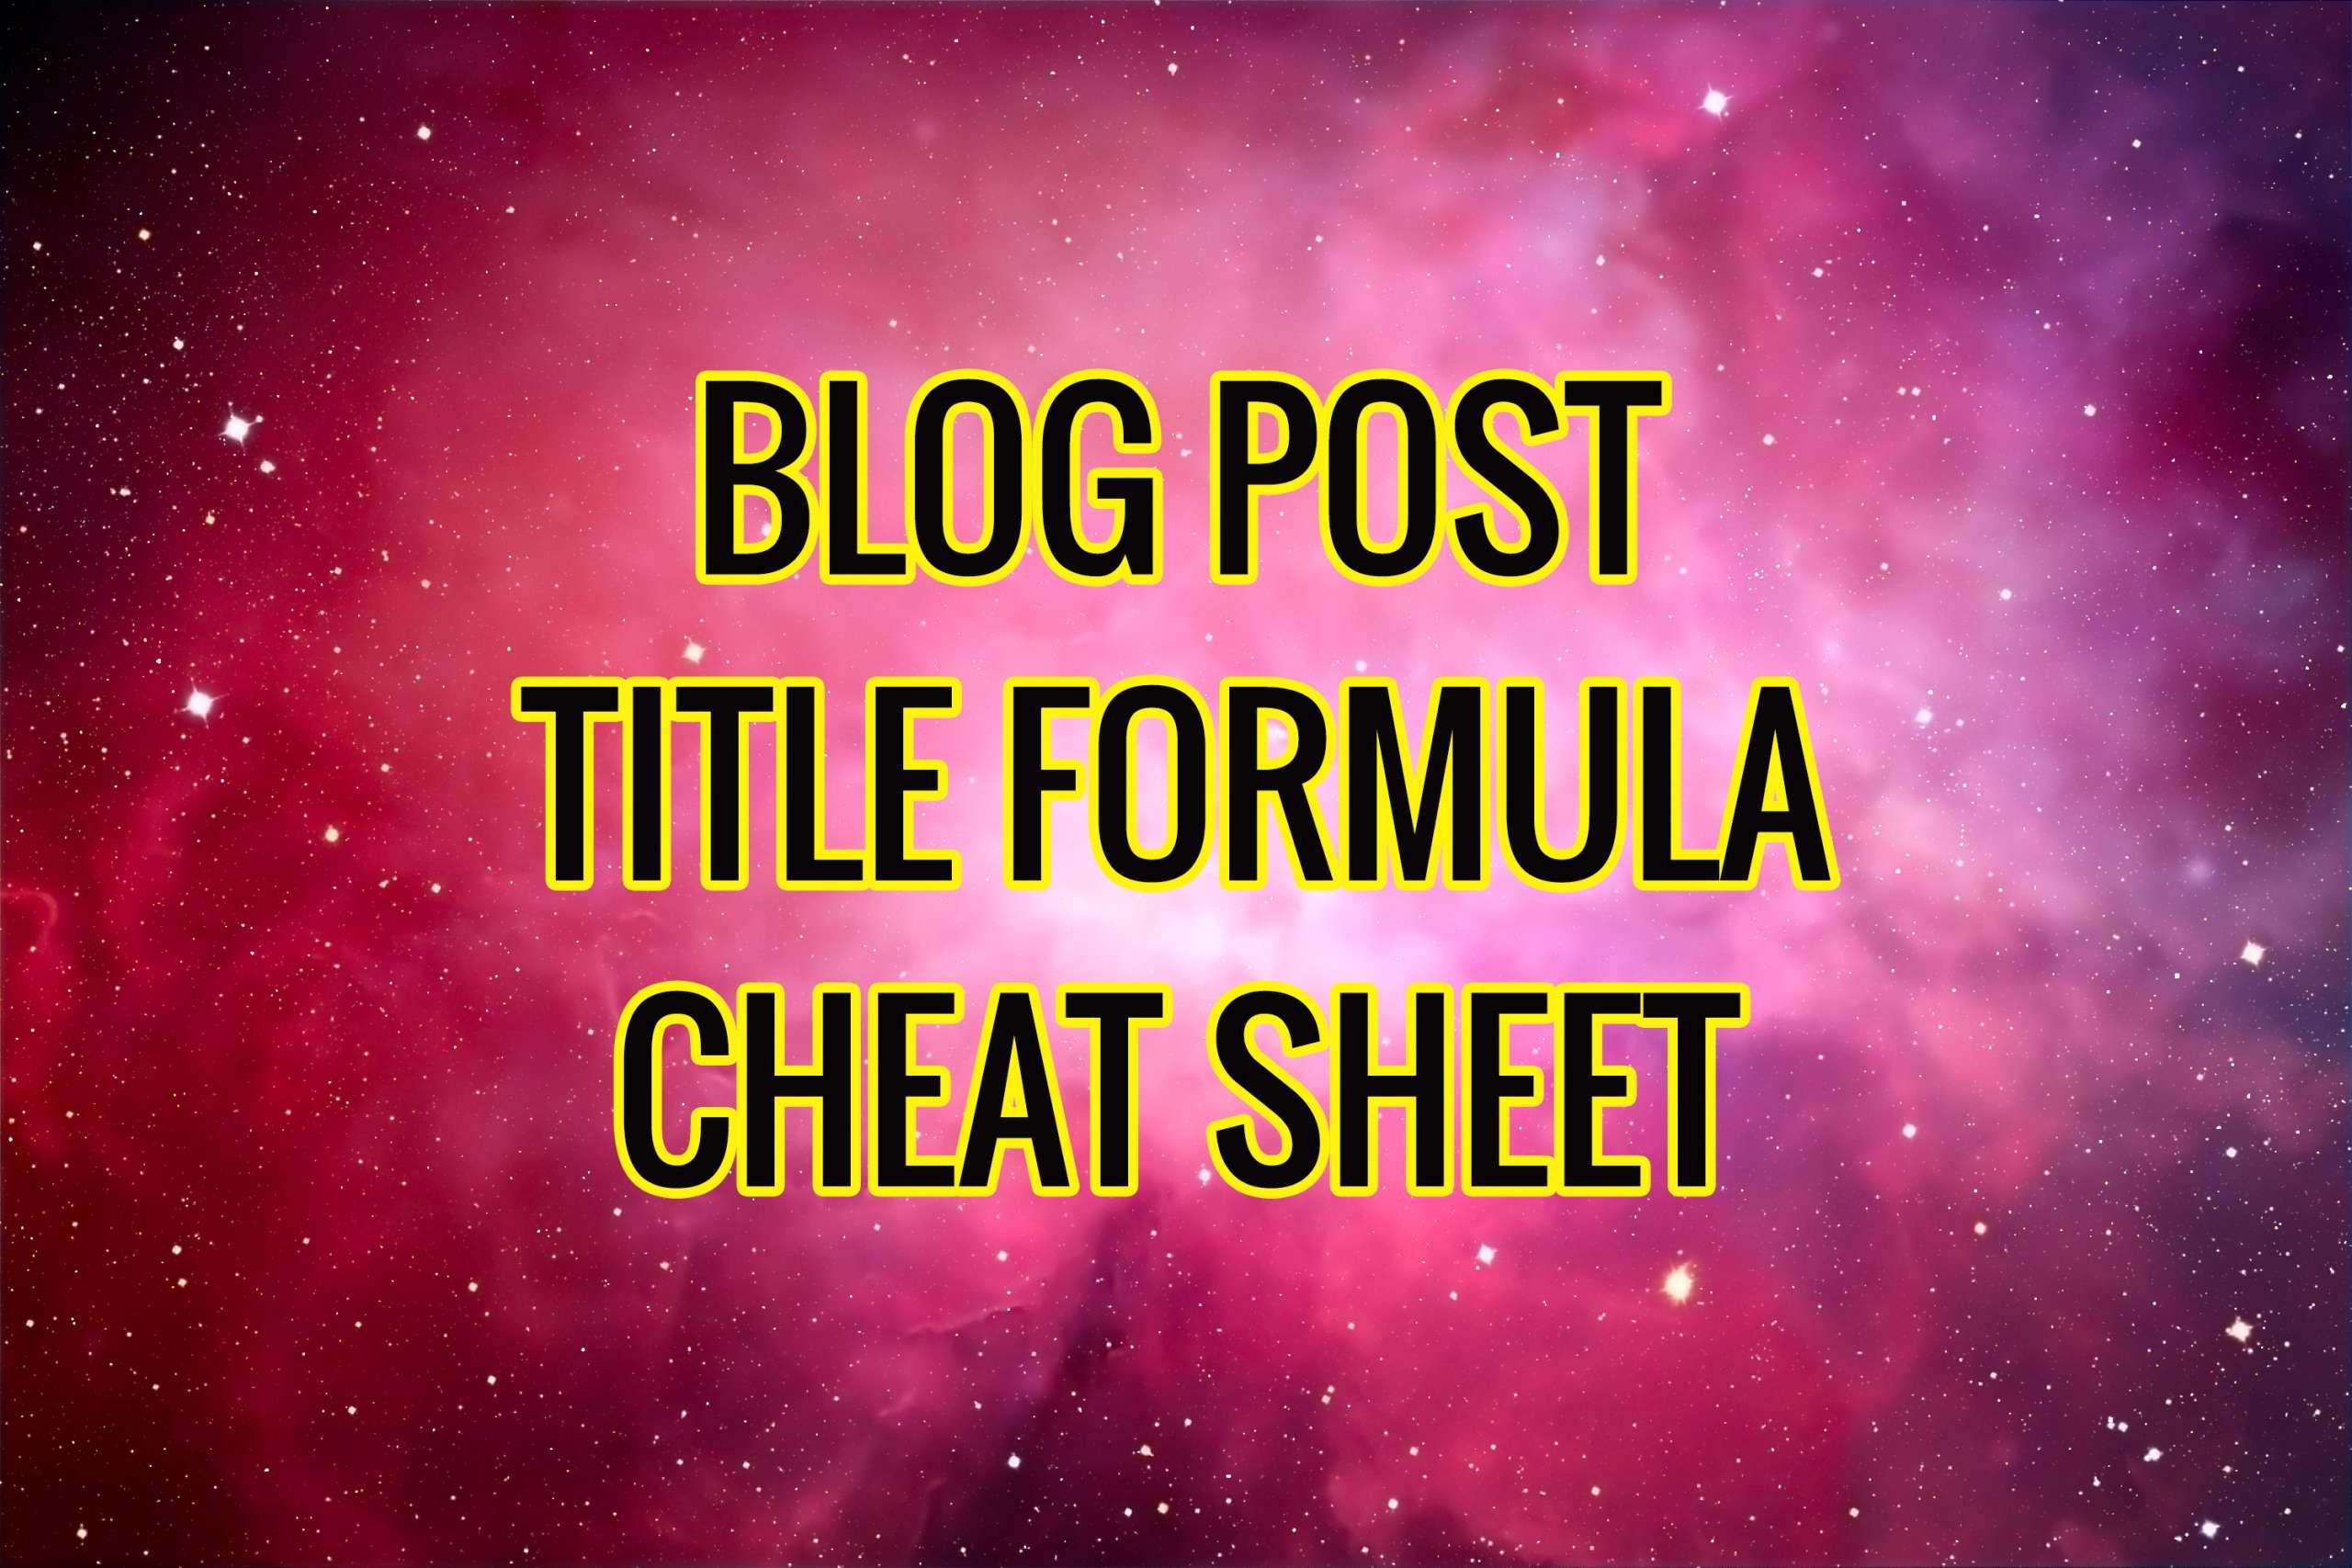 Blog Post Title Formula Cheat Sheet